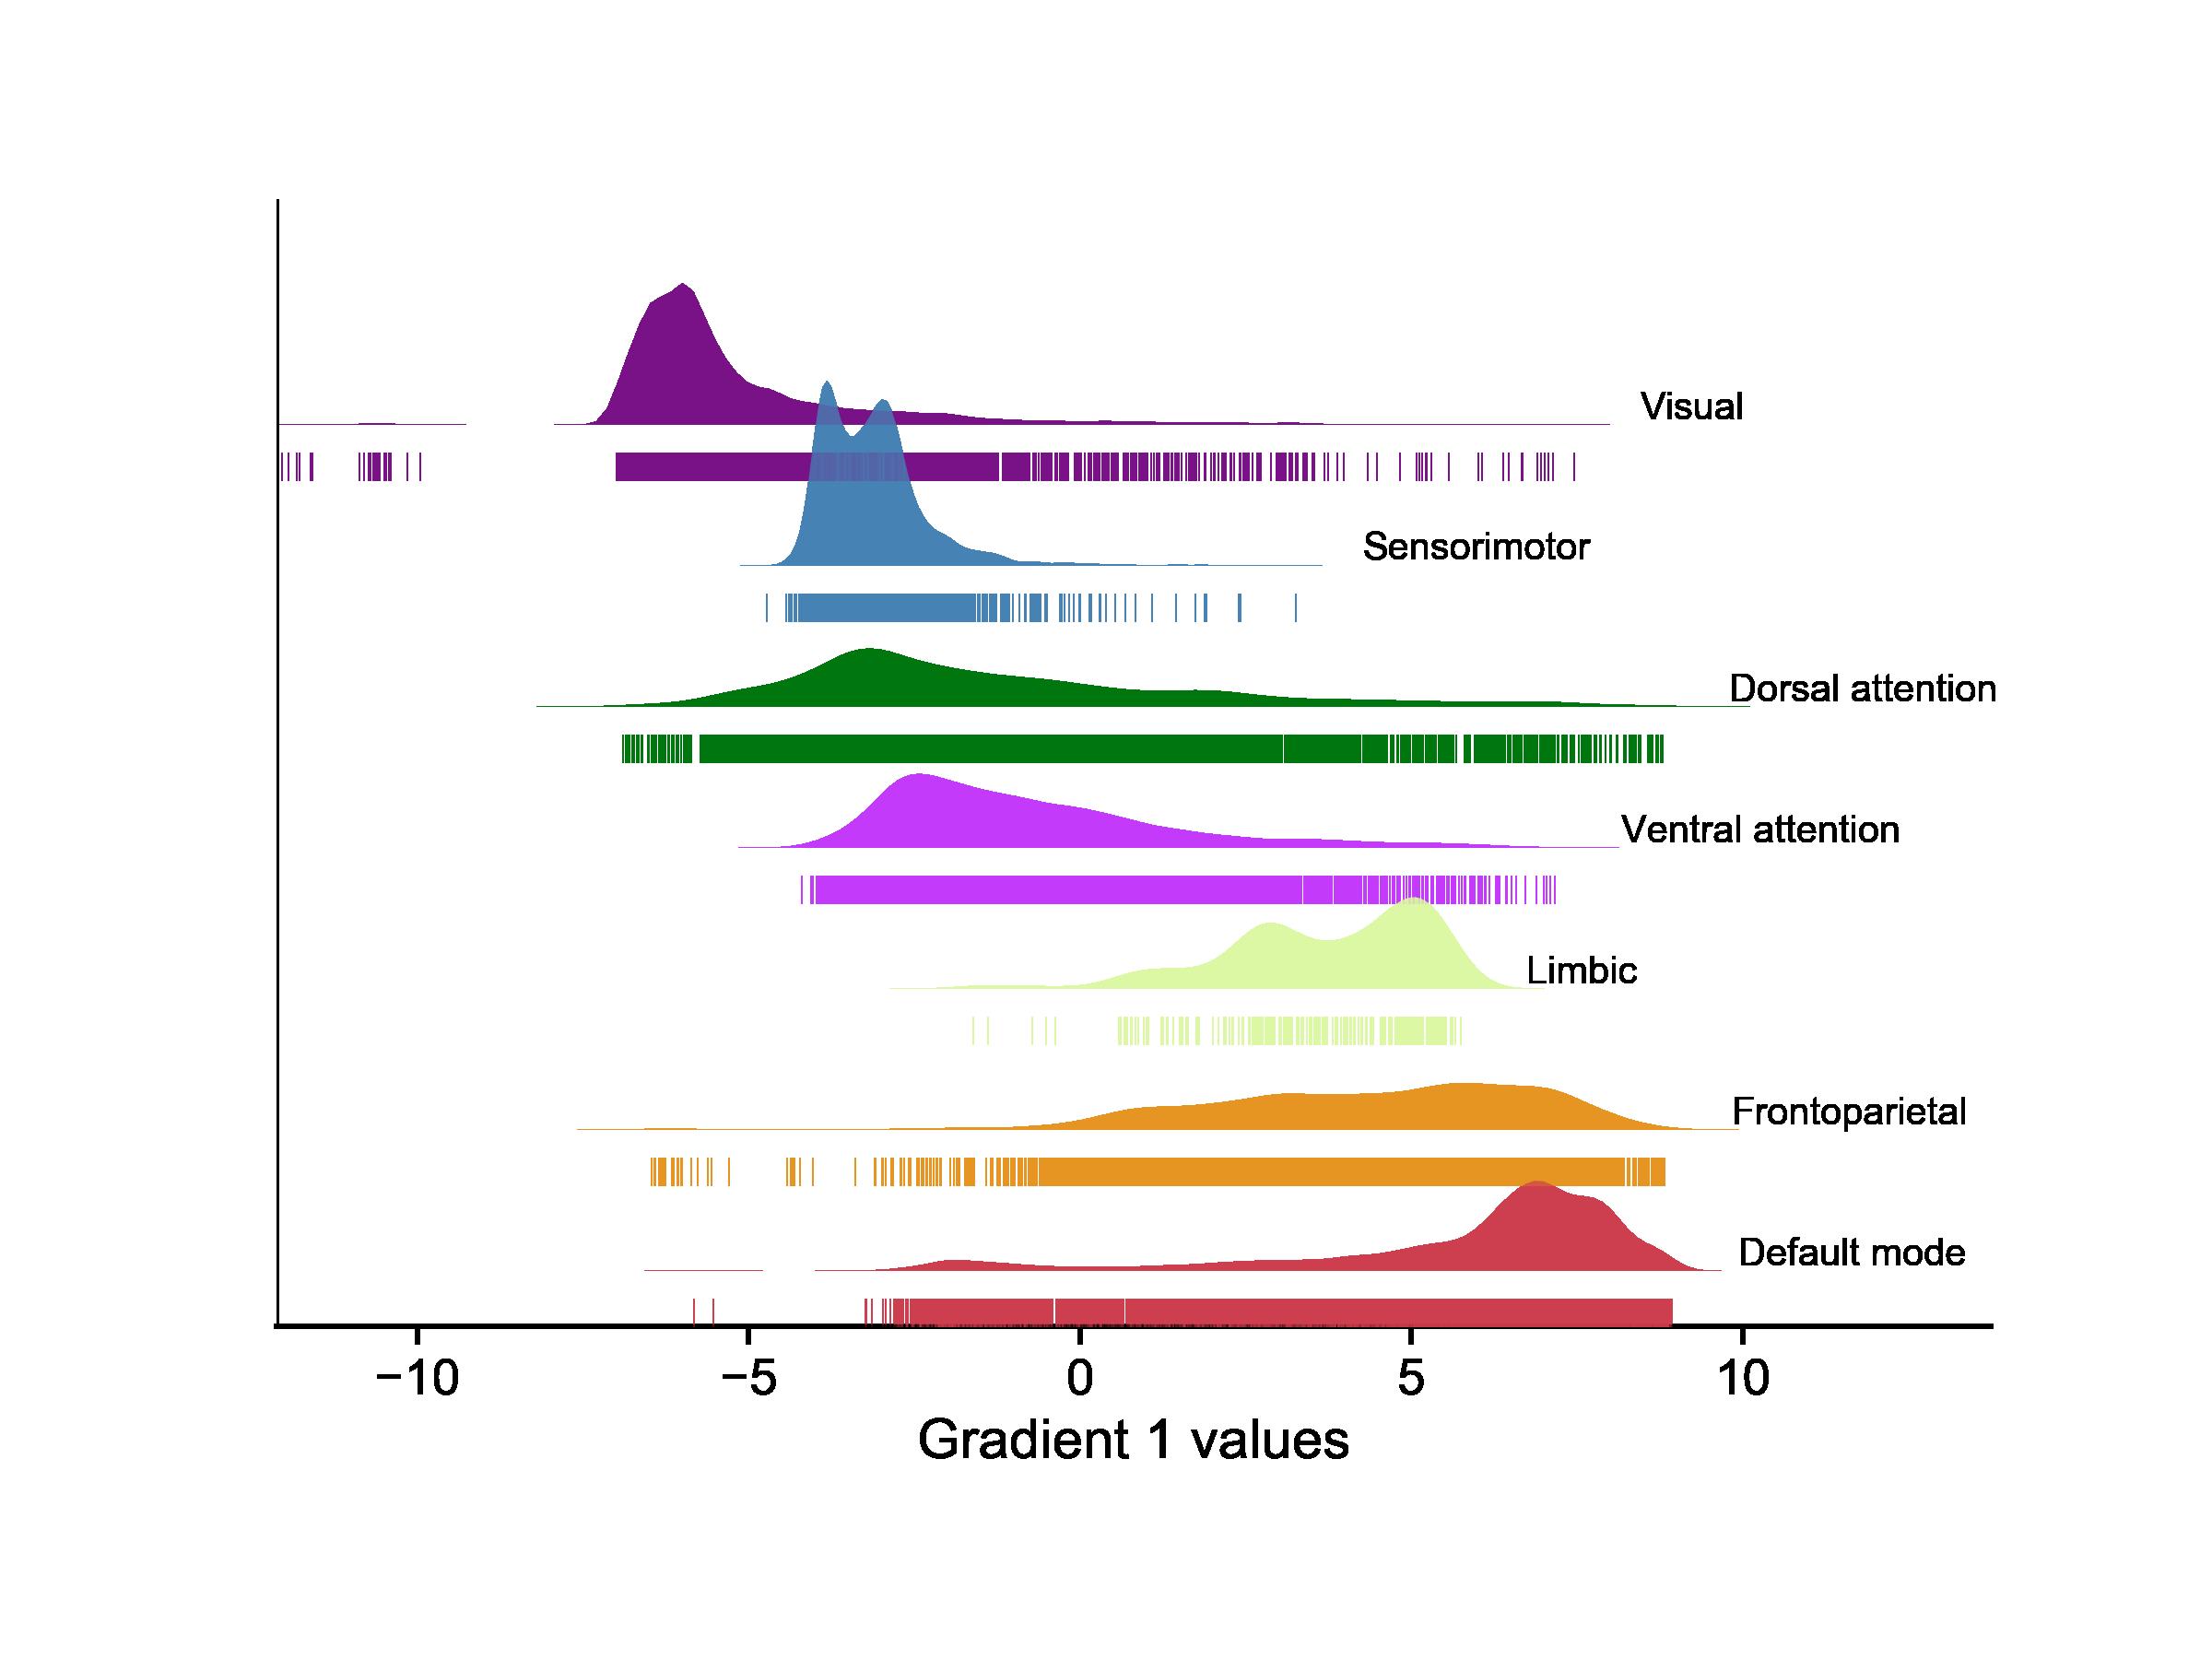 reports/figures/CCA/niftis/common_regions_gradient_dist_rug.png